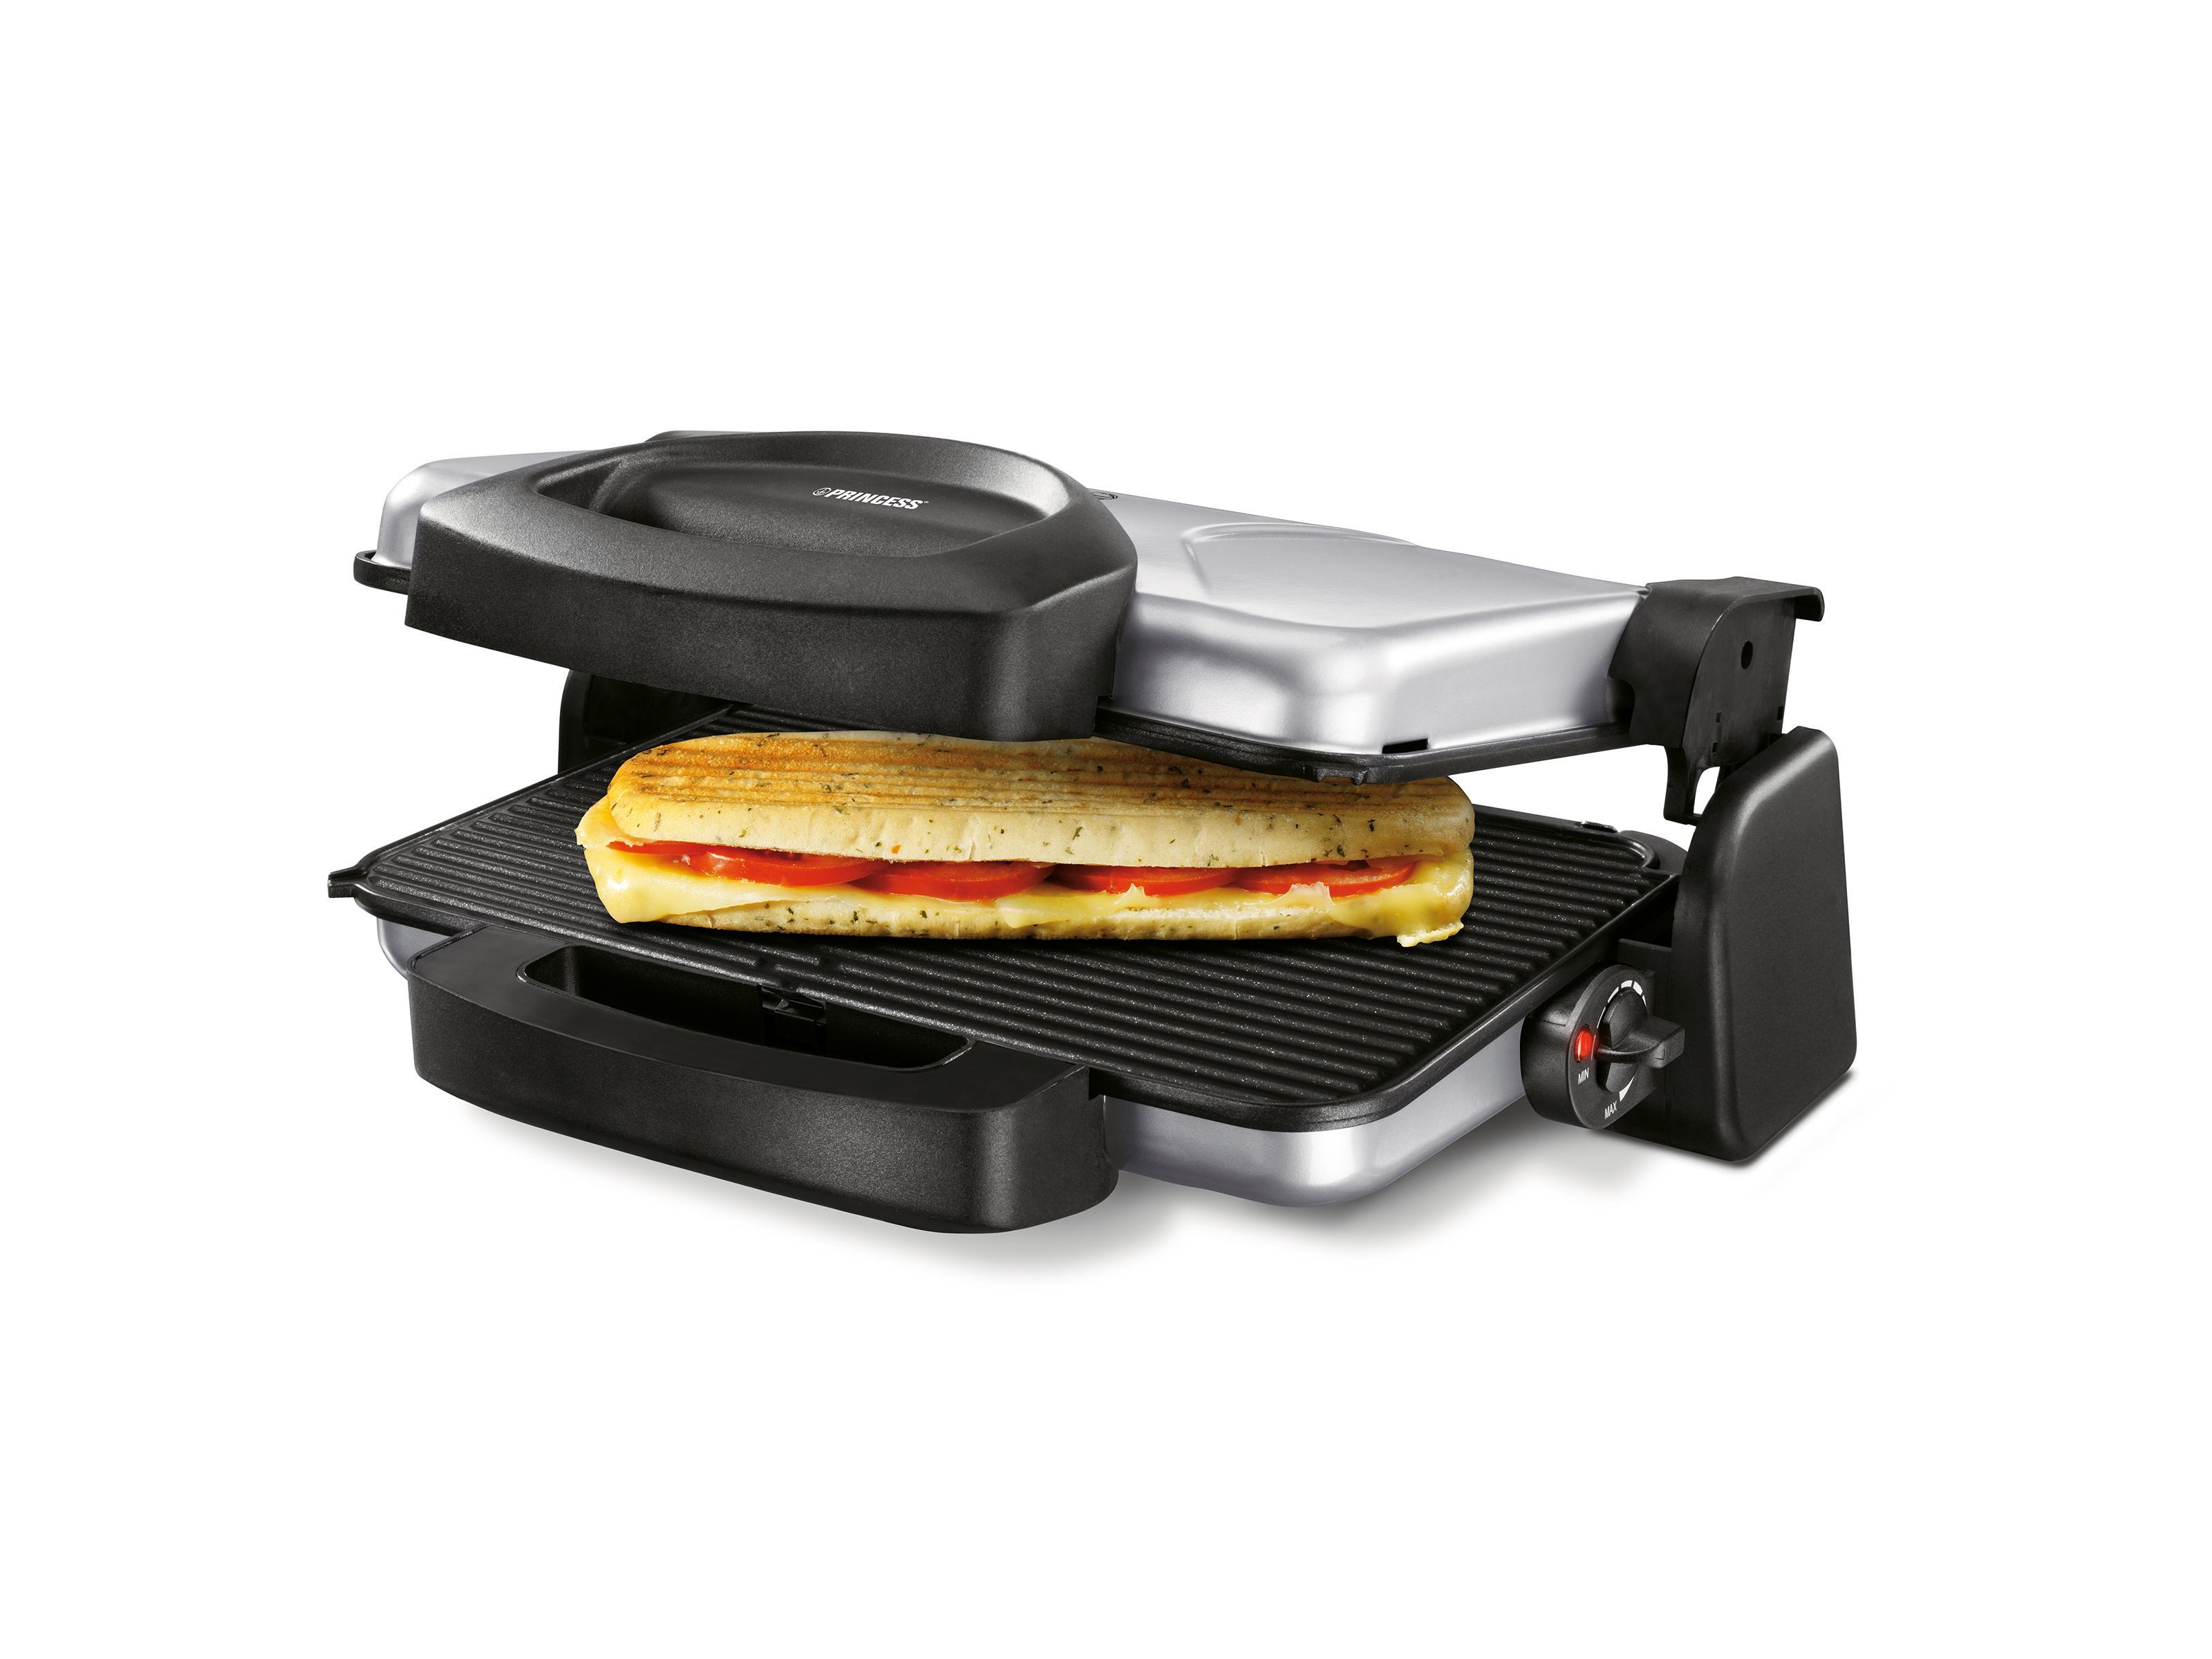 appareil croque gaufre panini